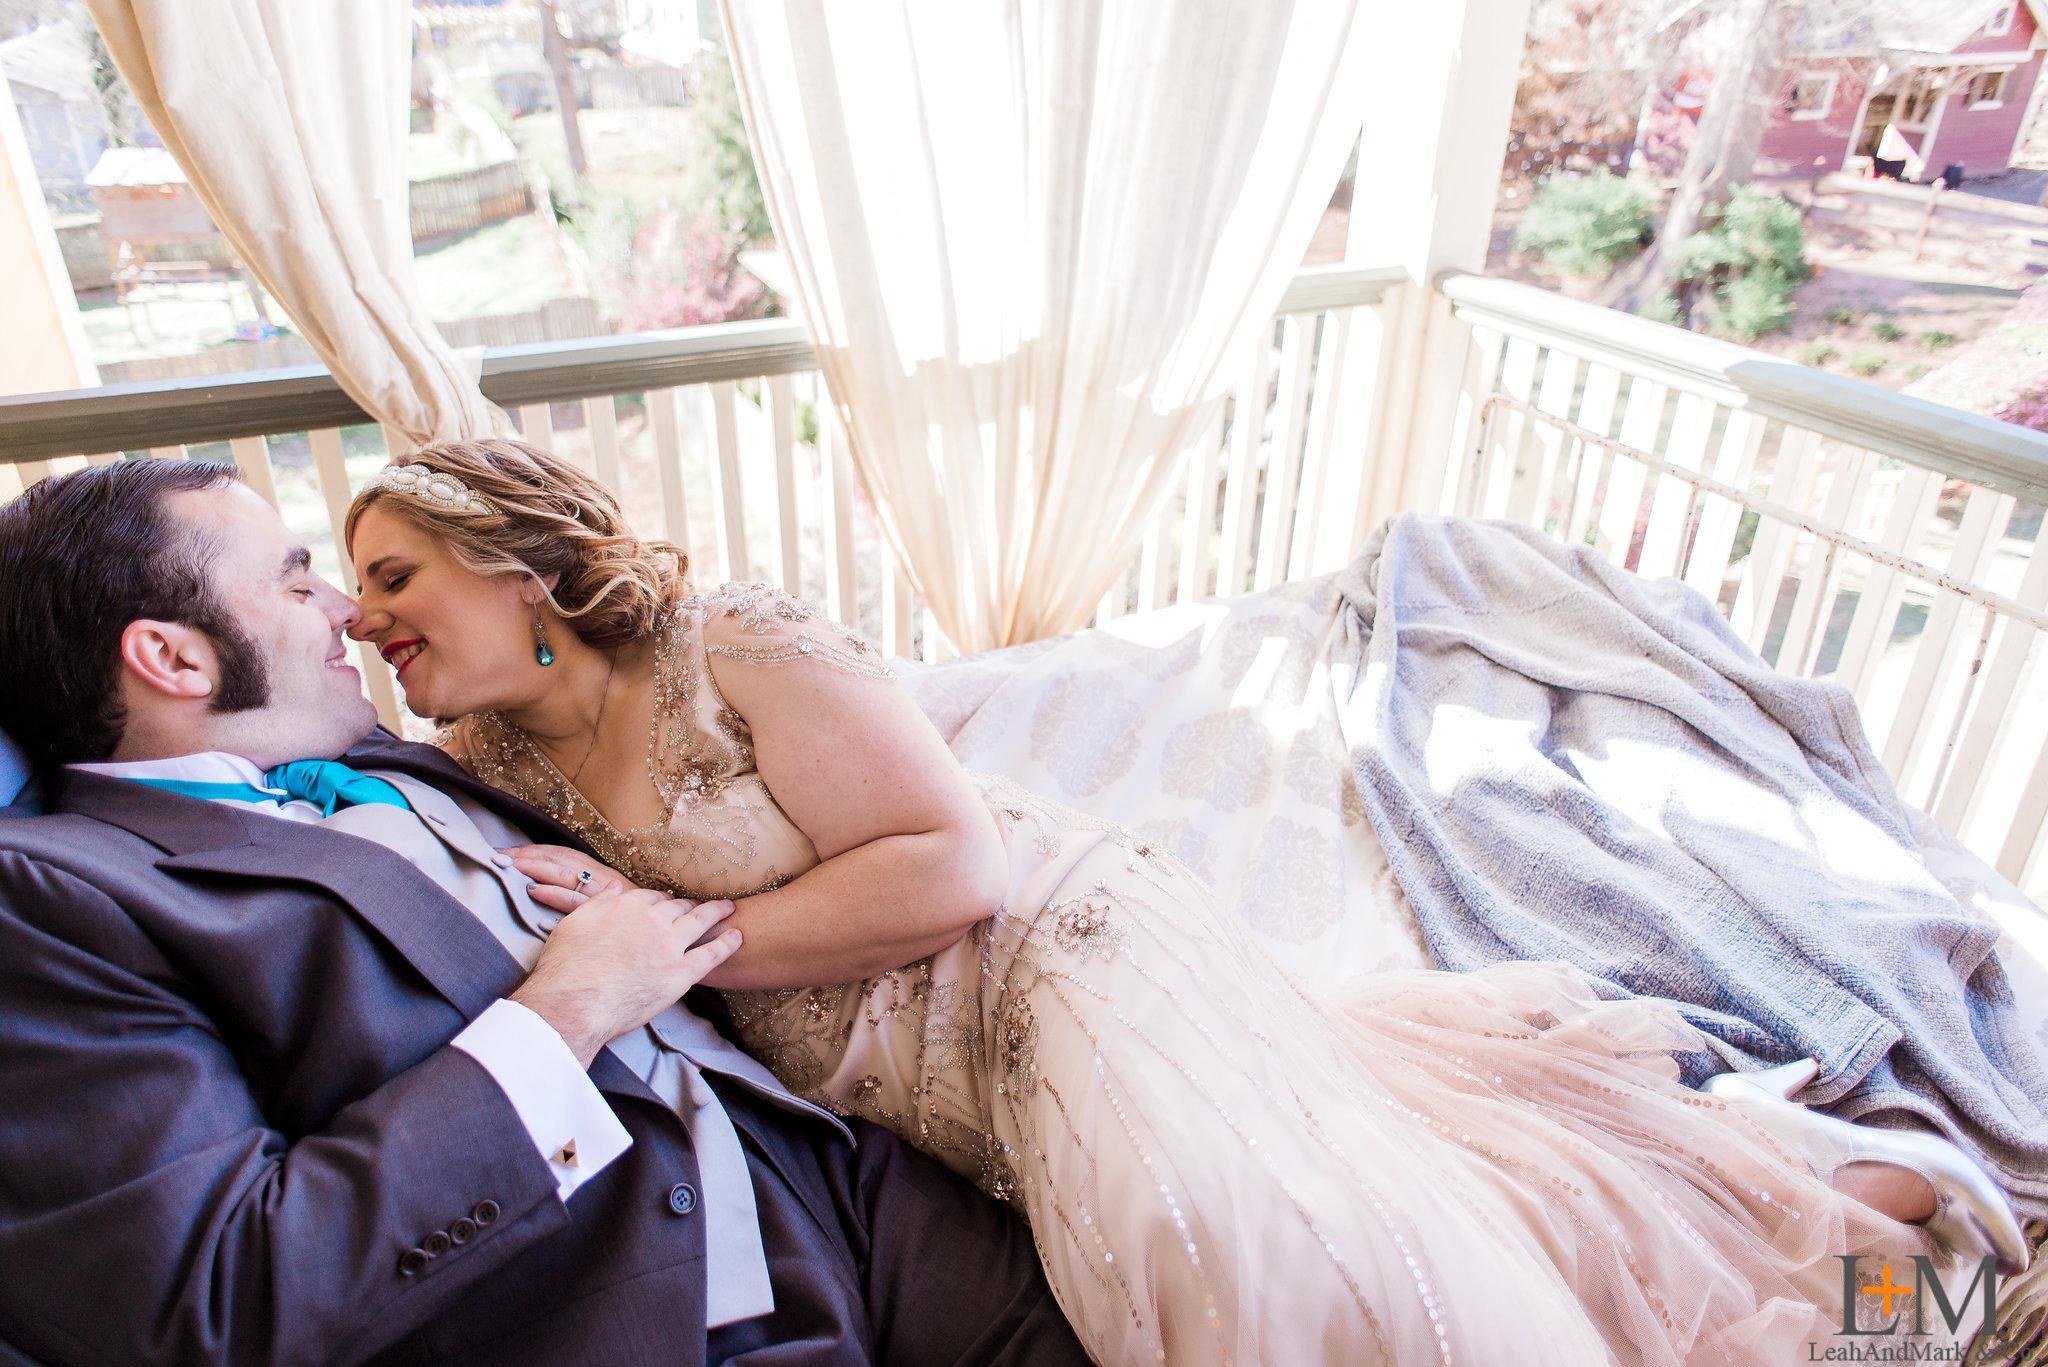 The Social Goat, Wedding Venue, Atlanta, Grant Park, Small, Affordable, Bed & Breakfast